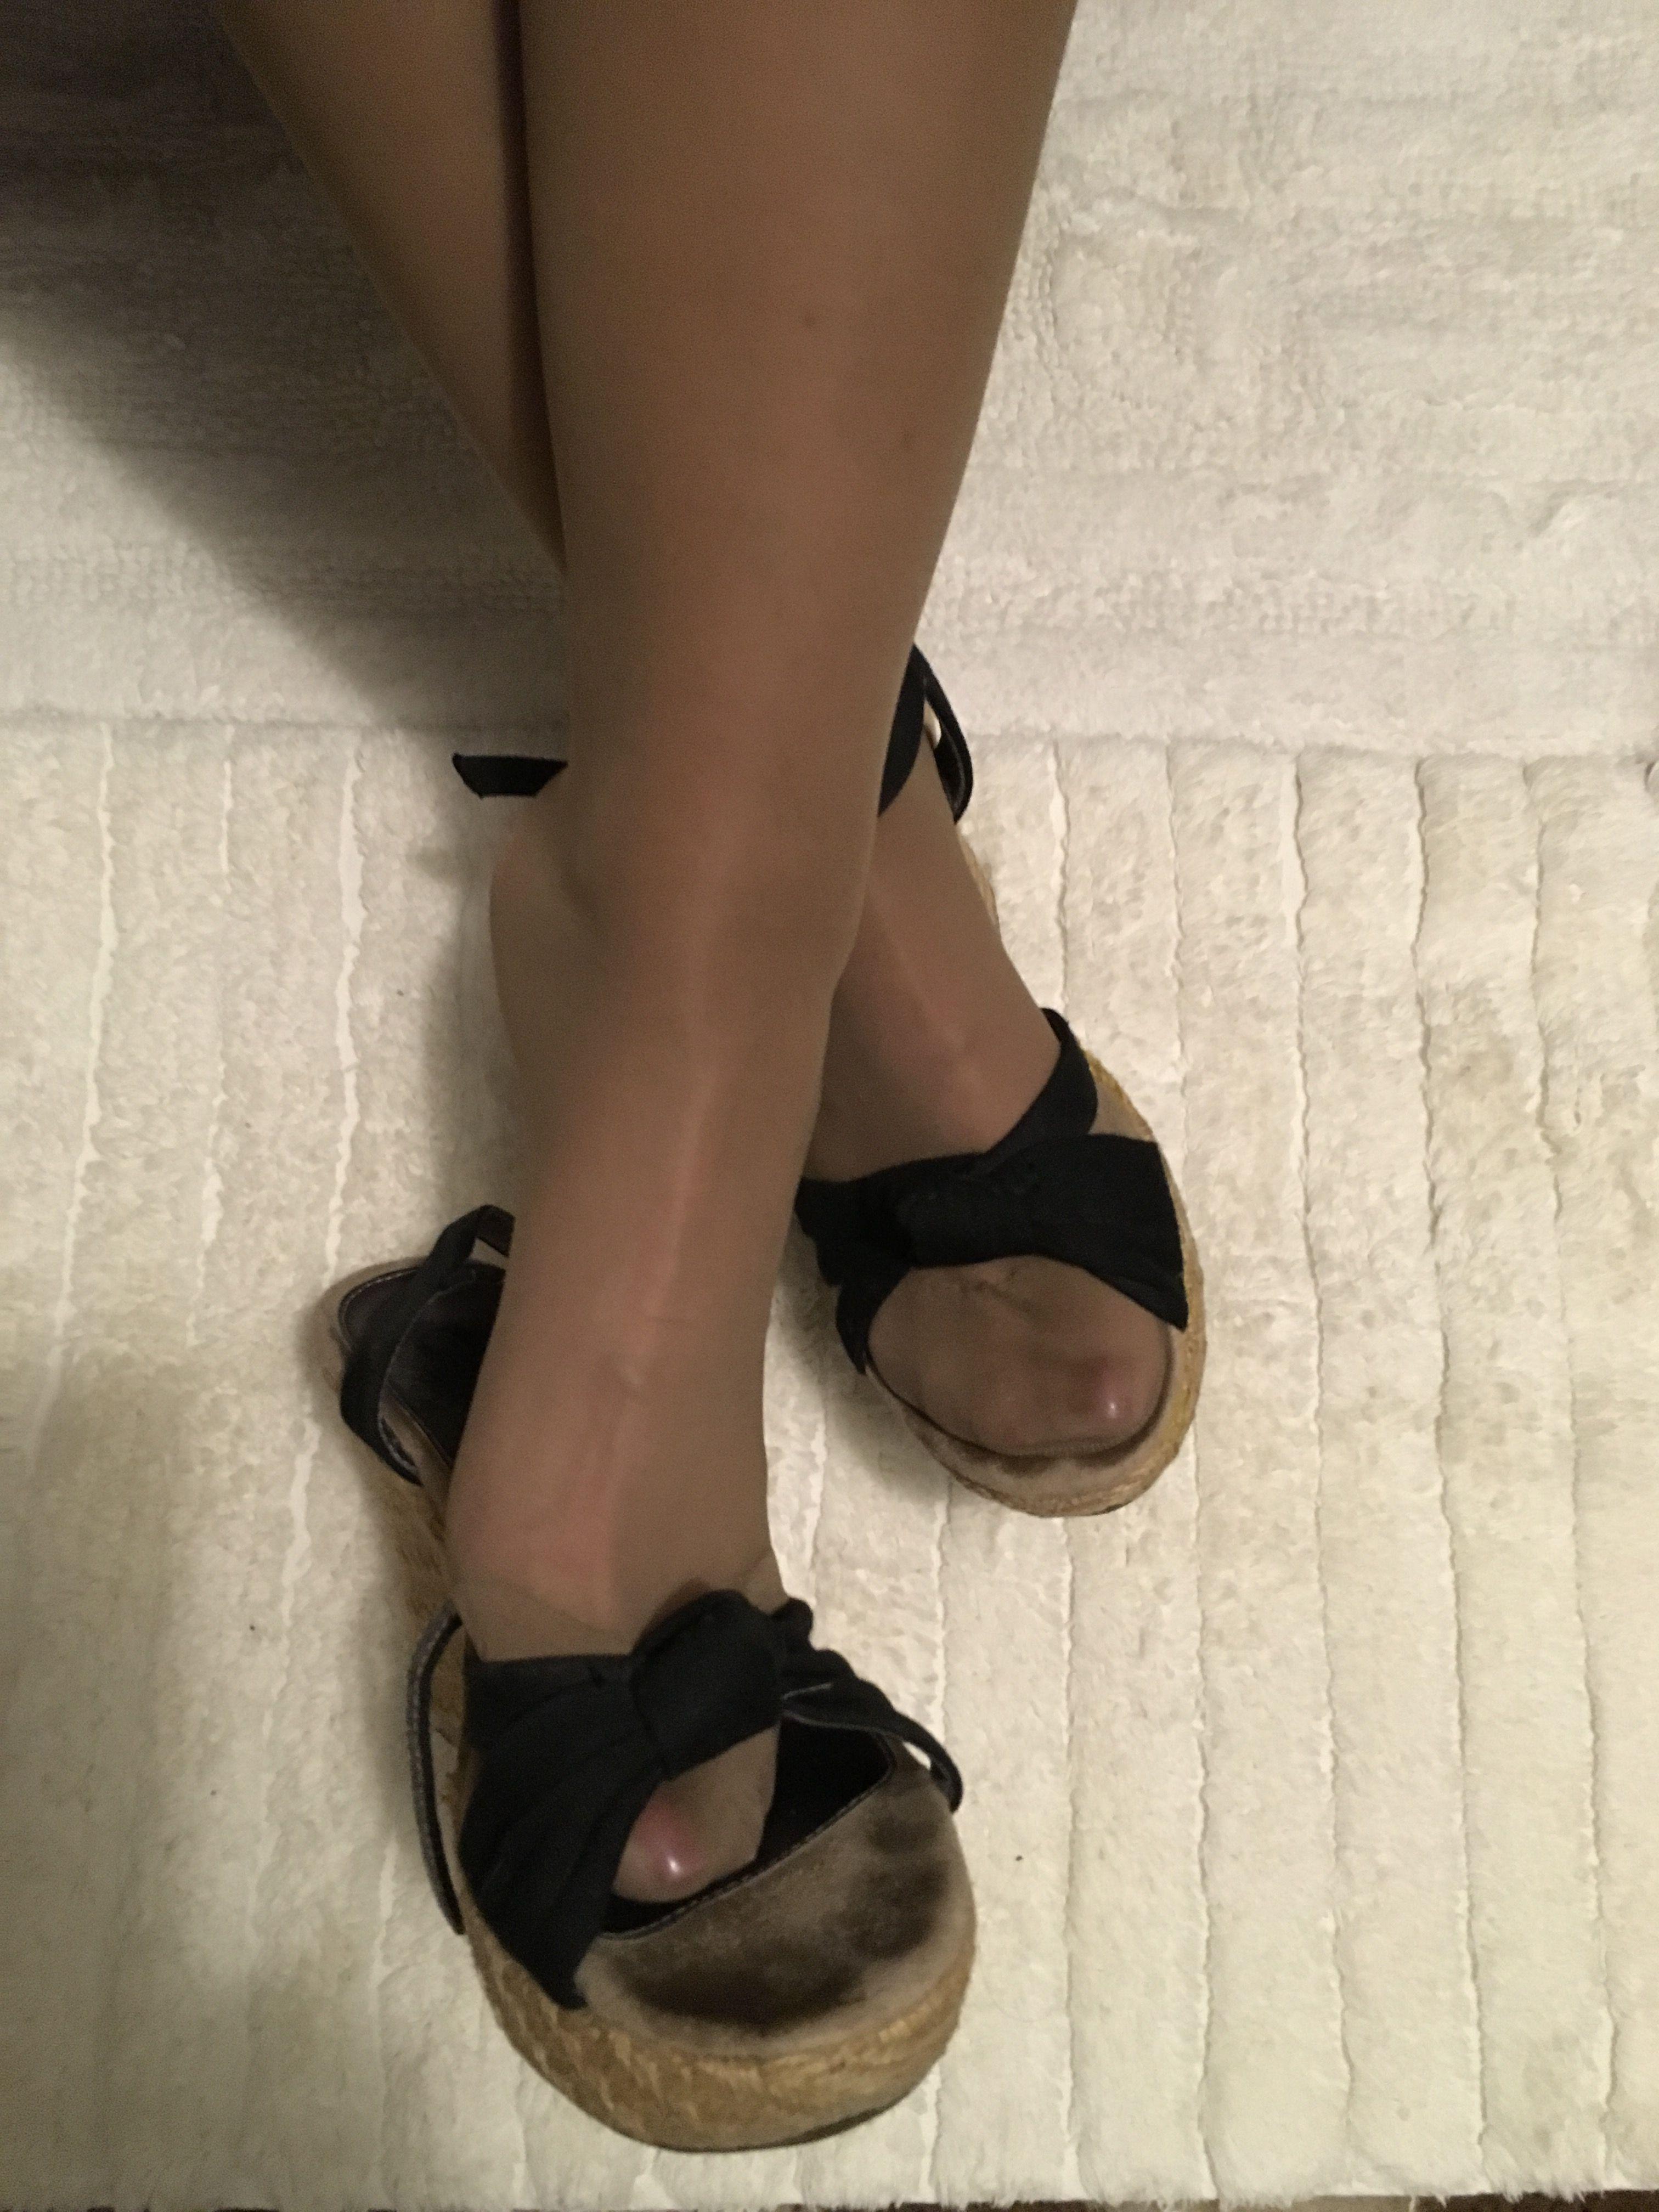 fafd116913 Reinforced toe pantyhose feet in wedges | Reinforced Toes ...